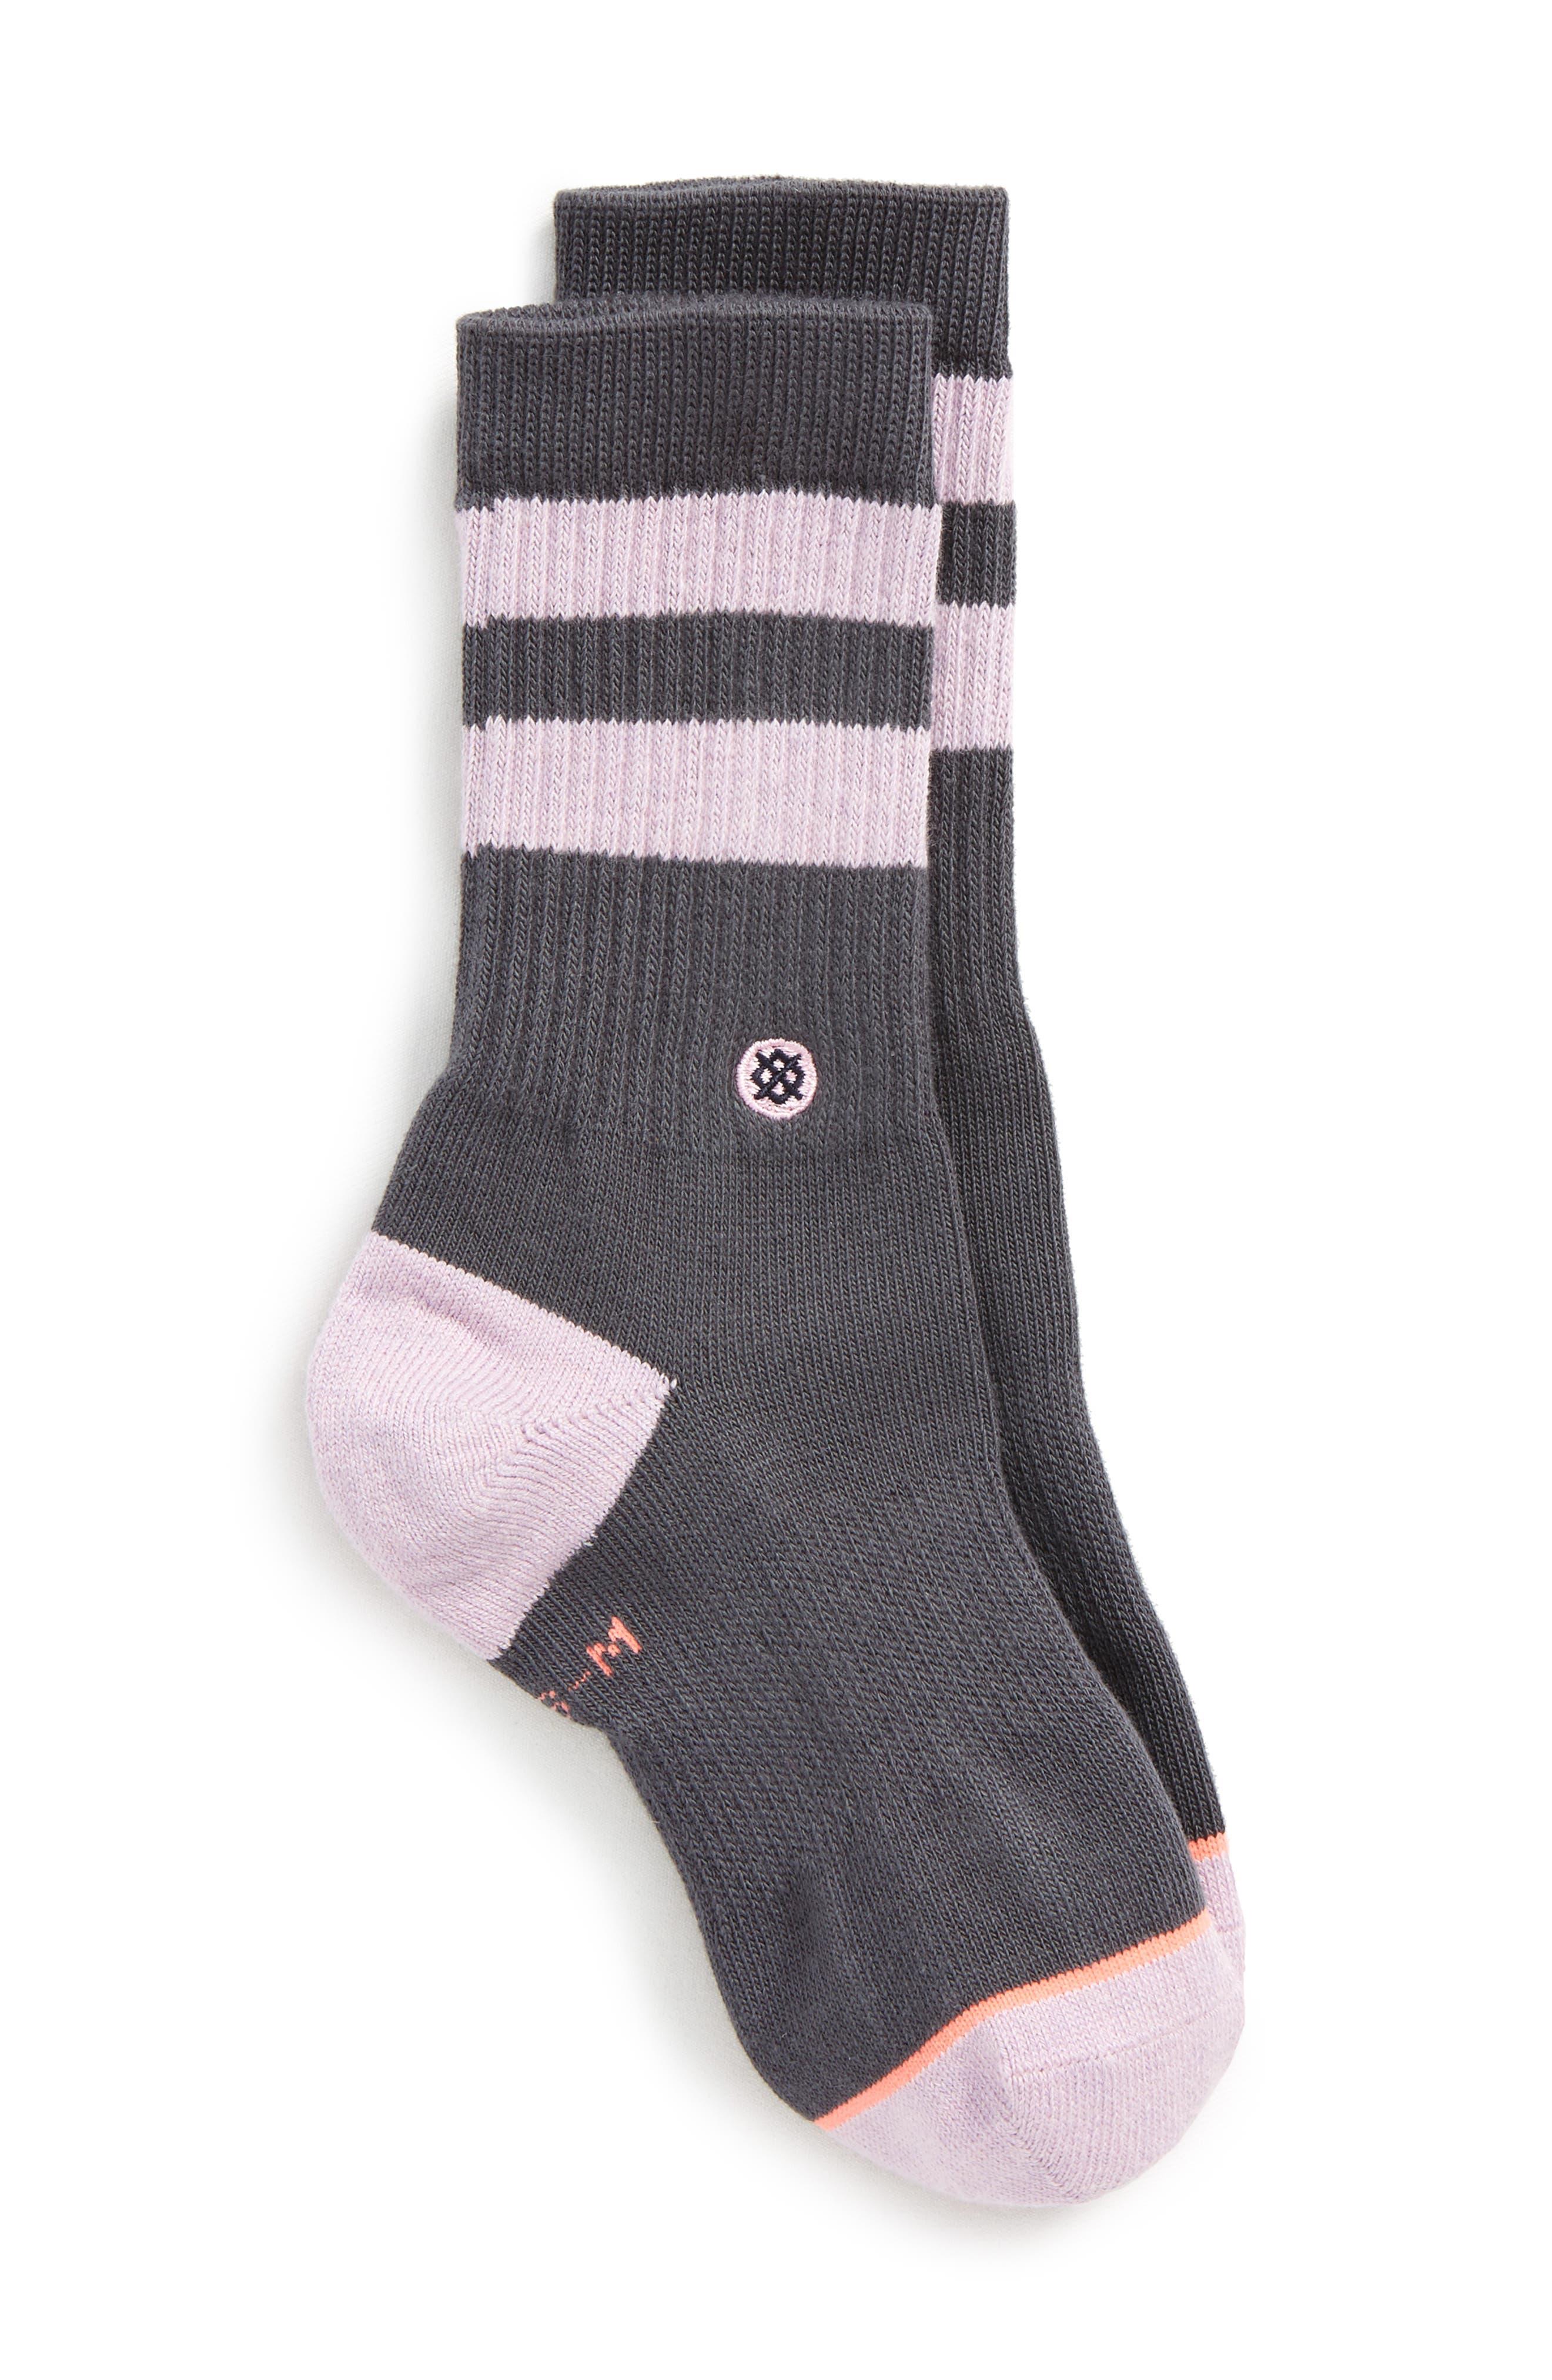 Alternate Image 1 Selected - Stance Harmony Crew Socks (Toddler, Little Kid & Big Kid)